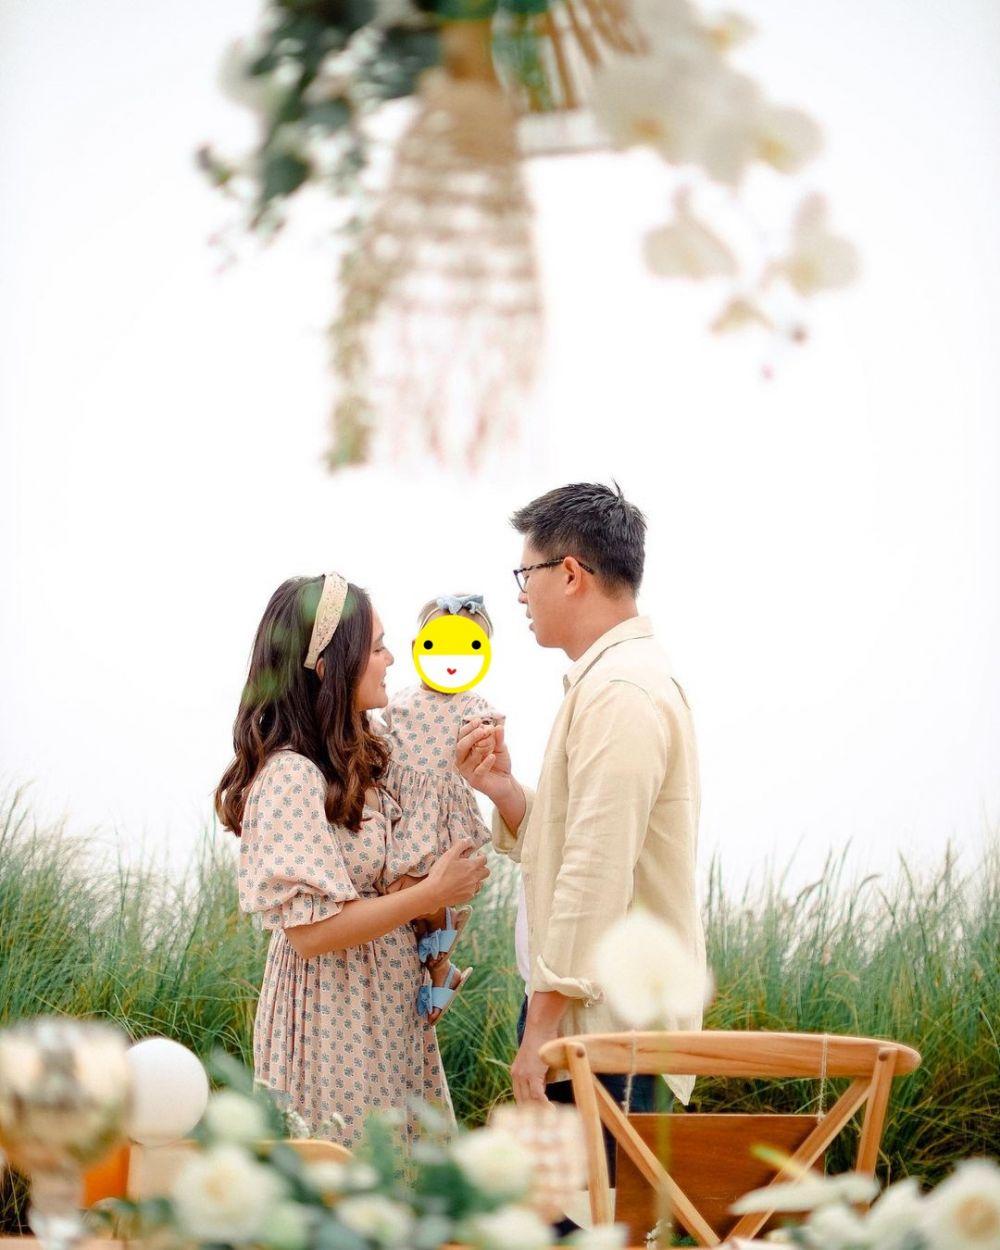 Potret perayaan anniversary pernikahan ke-9 Shandy Aulia Instagram